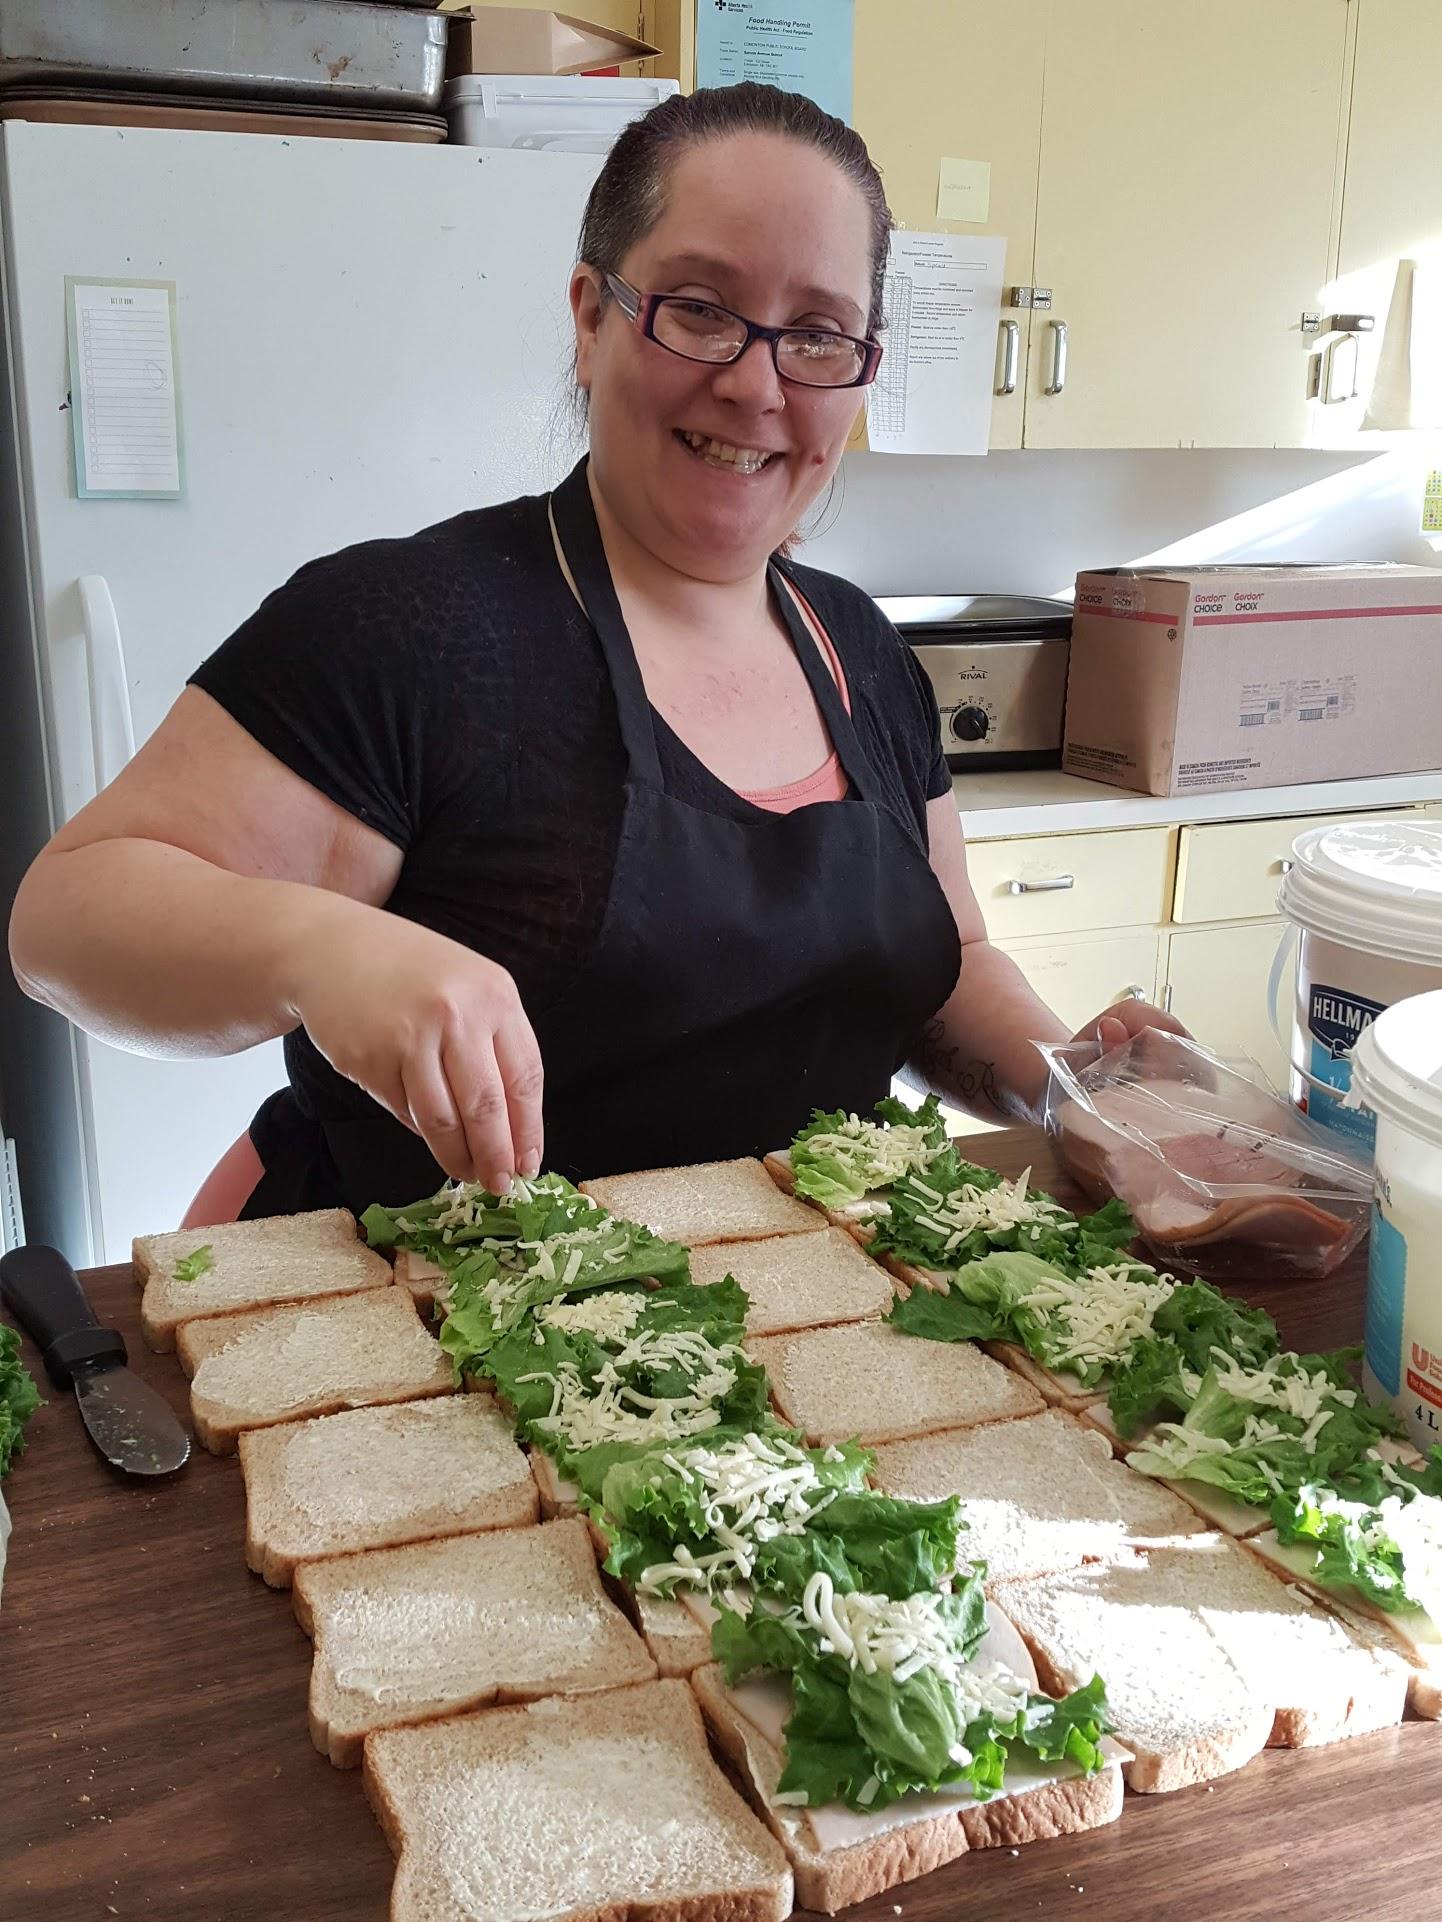 Tamara Kelly adding grated cheese to fresh turkey sandwiches